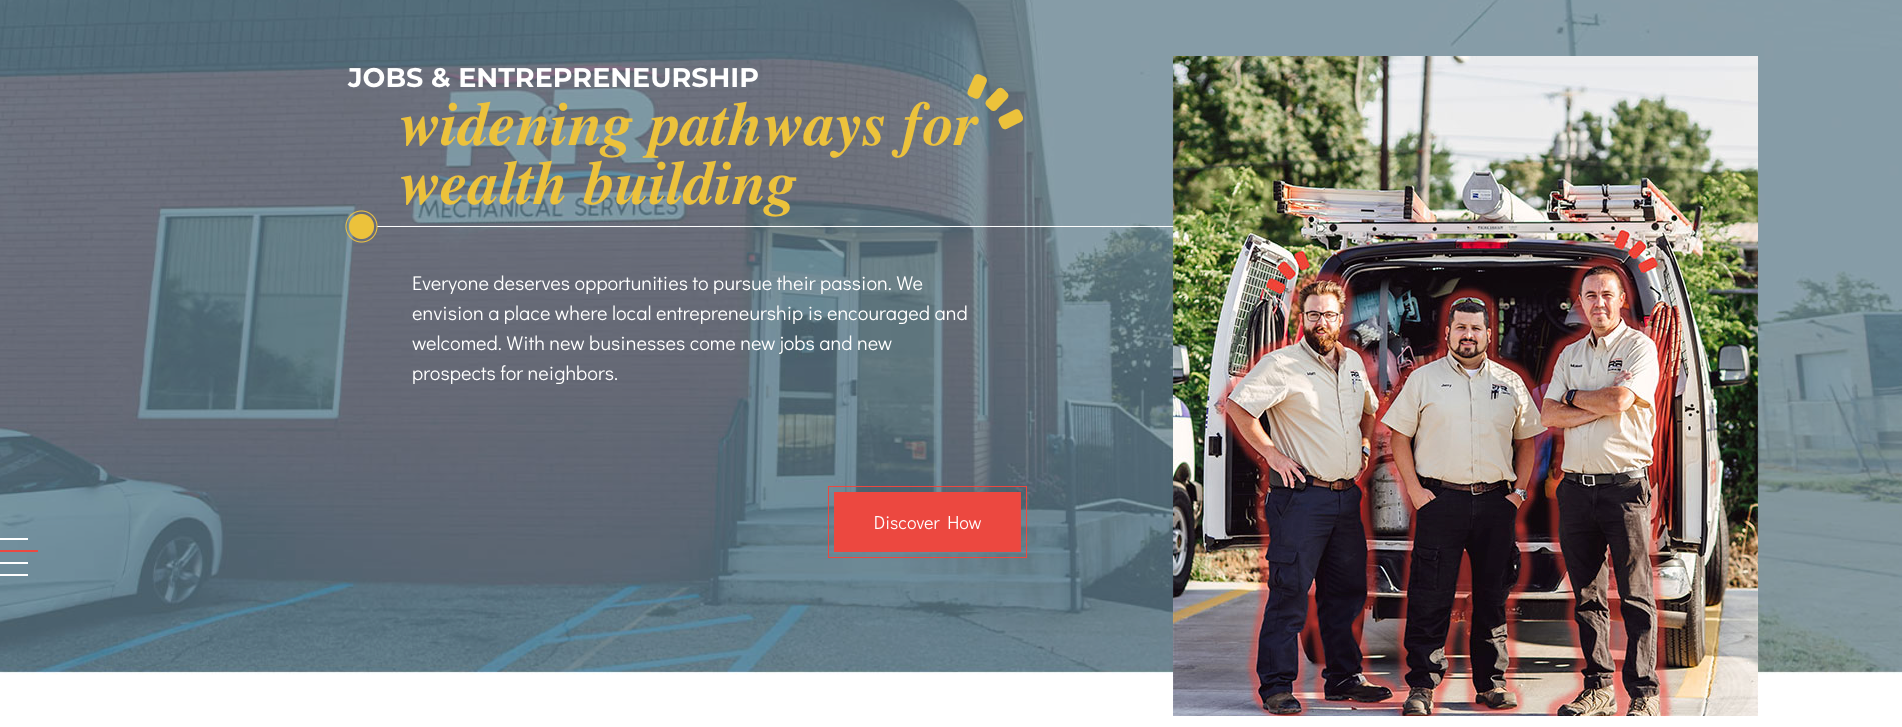 Amplify employment and entrepreneurship banner